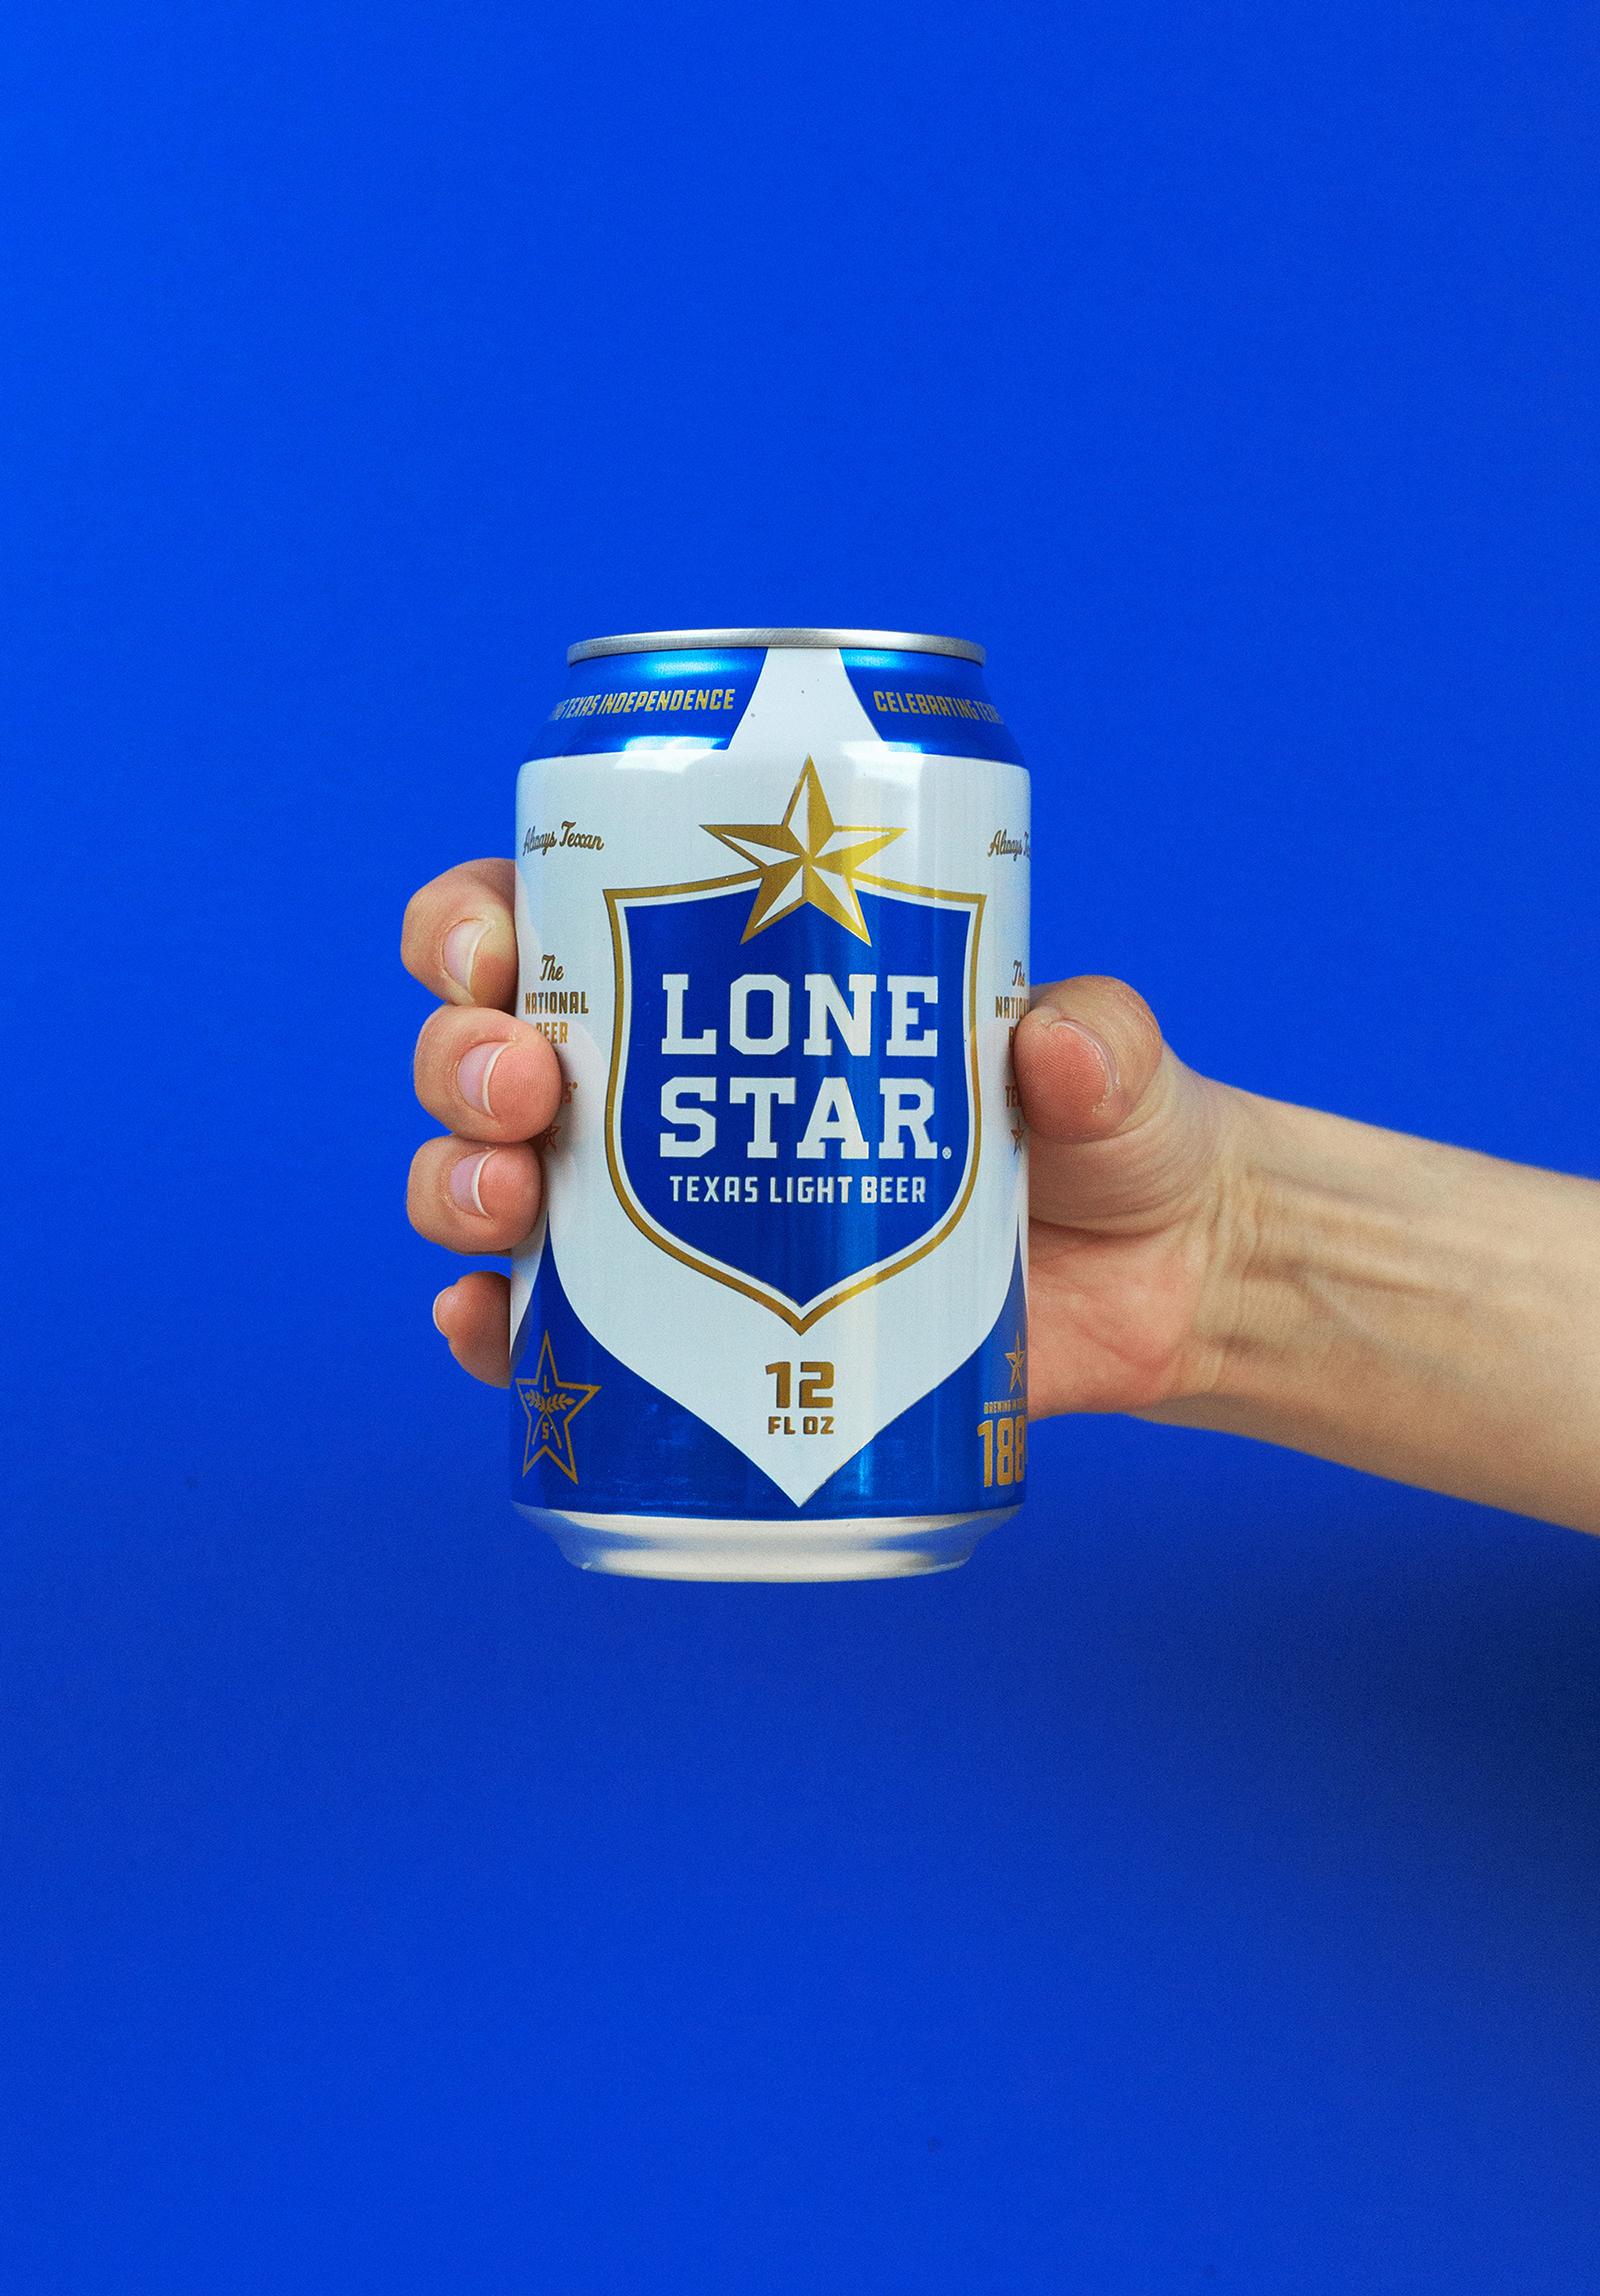 Lone Star孤星啤酒品牌更新全新的品牌VI视觉和包装设计-深圳VI设计15